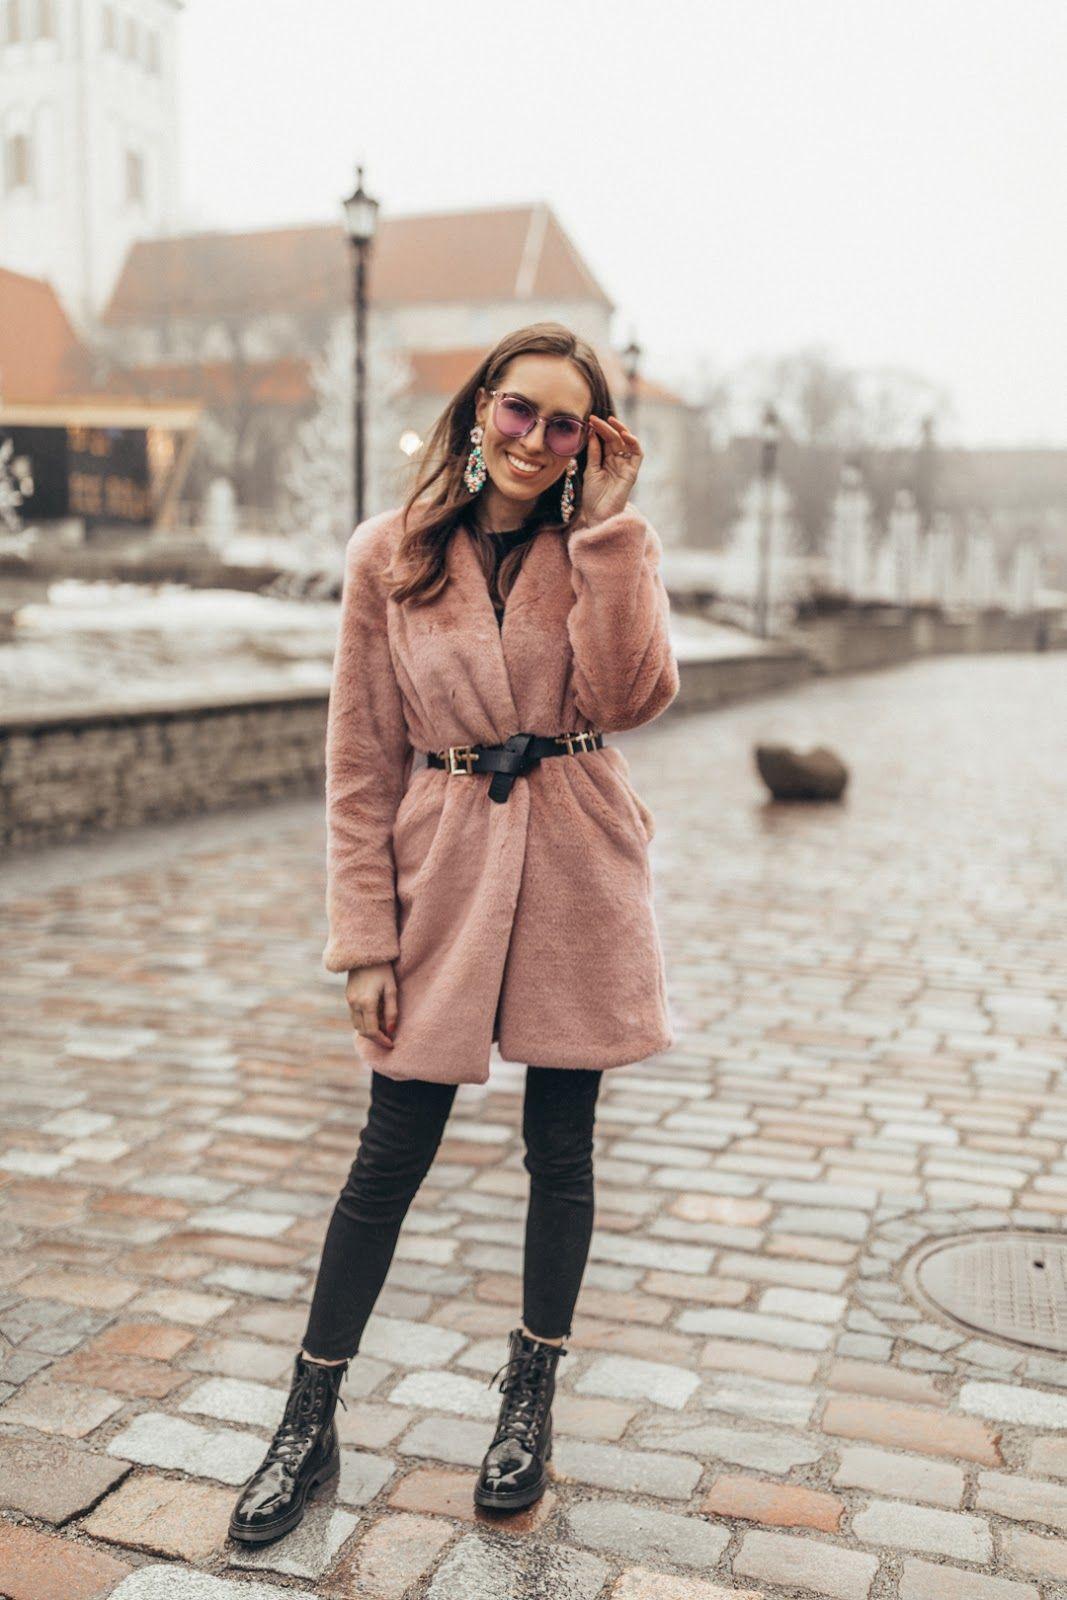 Black Belt Pink Fur Coat Outfit Fur Coat Outfit Pink Fur Coat Outfit Pink Fur Coat [ 1600 x 1067 Pixel ]